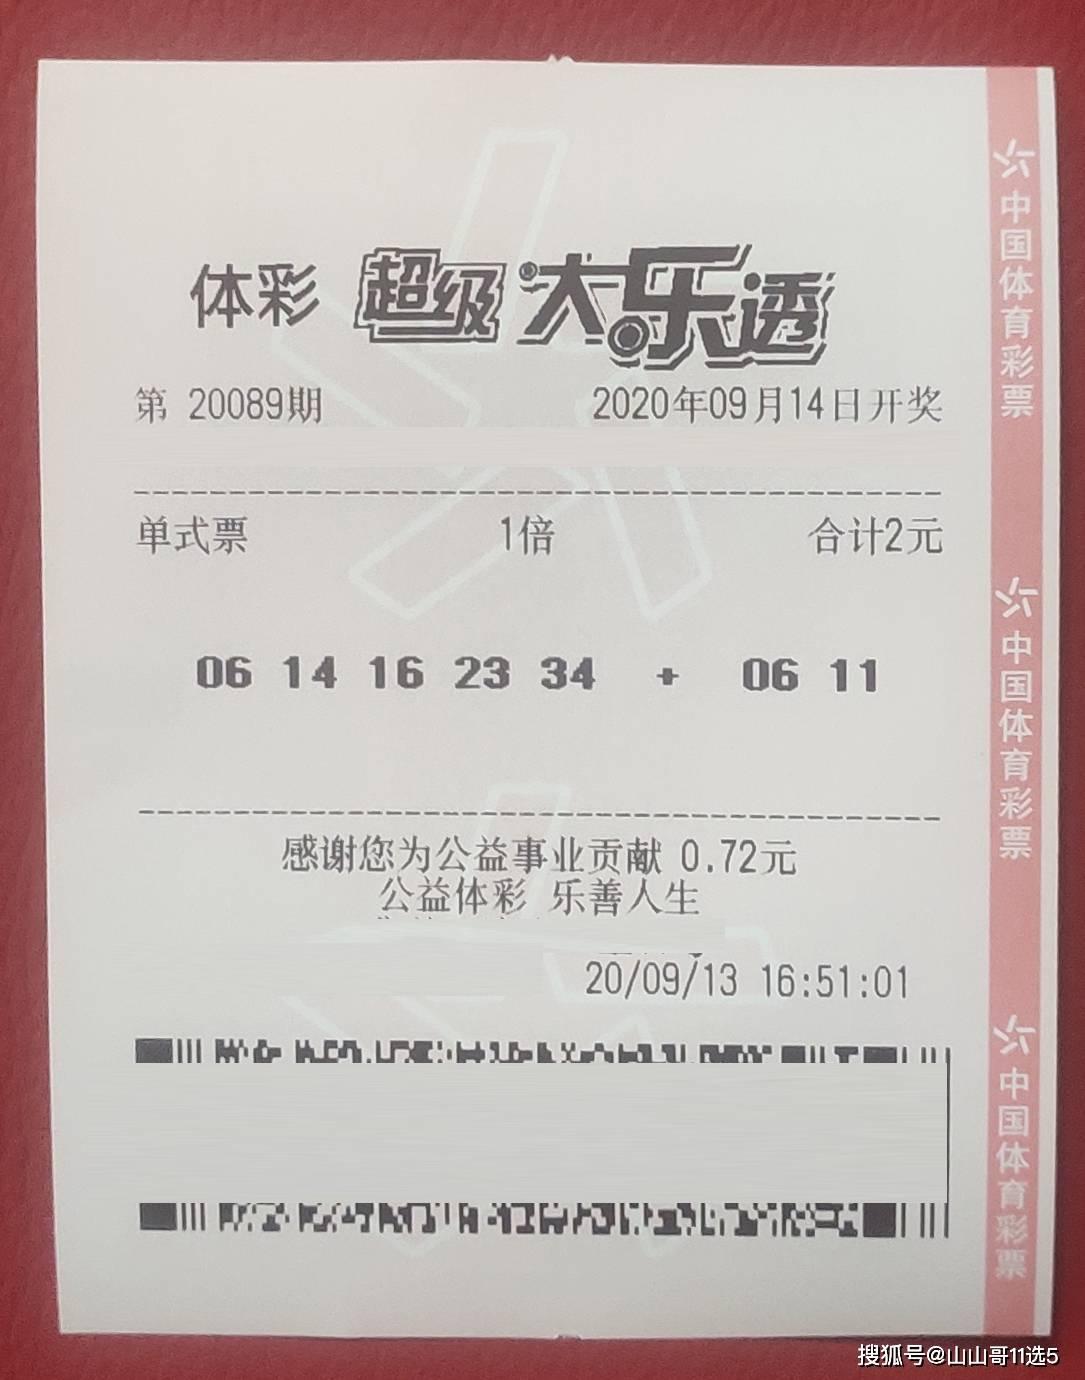 <strong>大彩票20089小故事,不要让</strong>